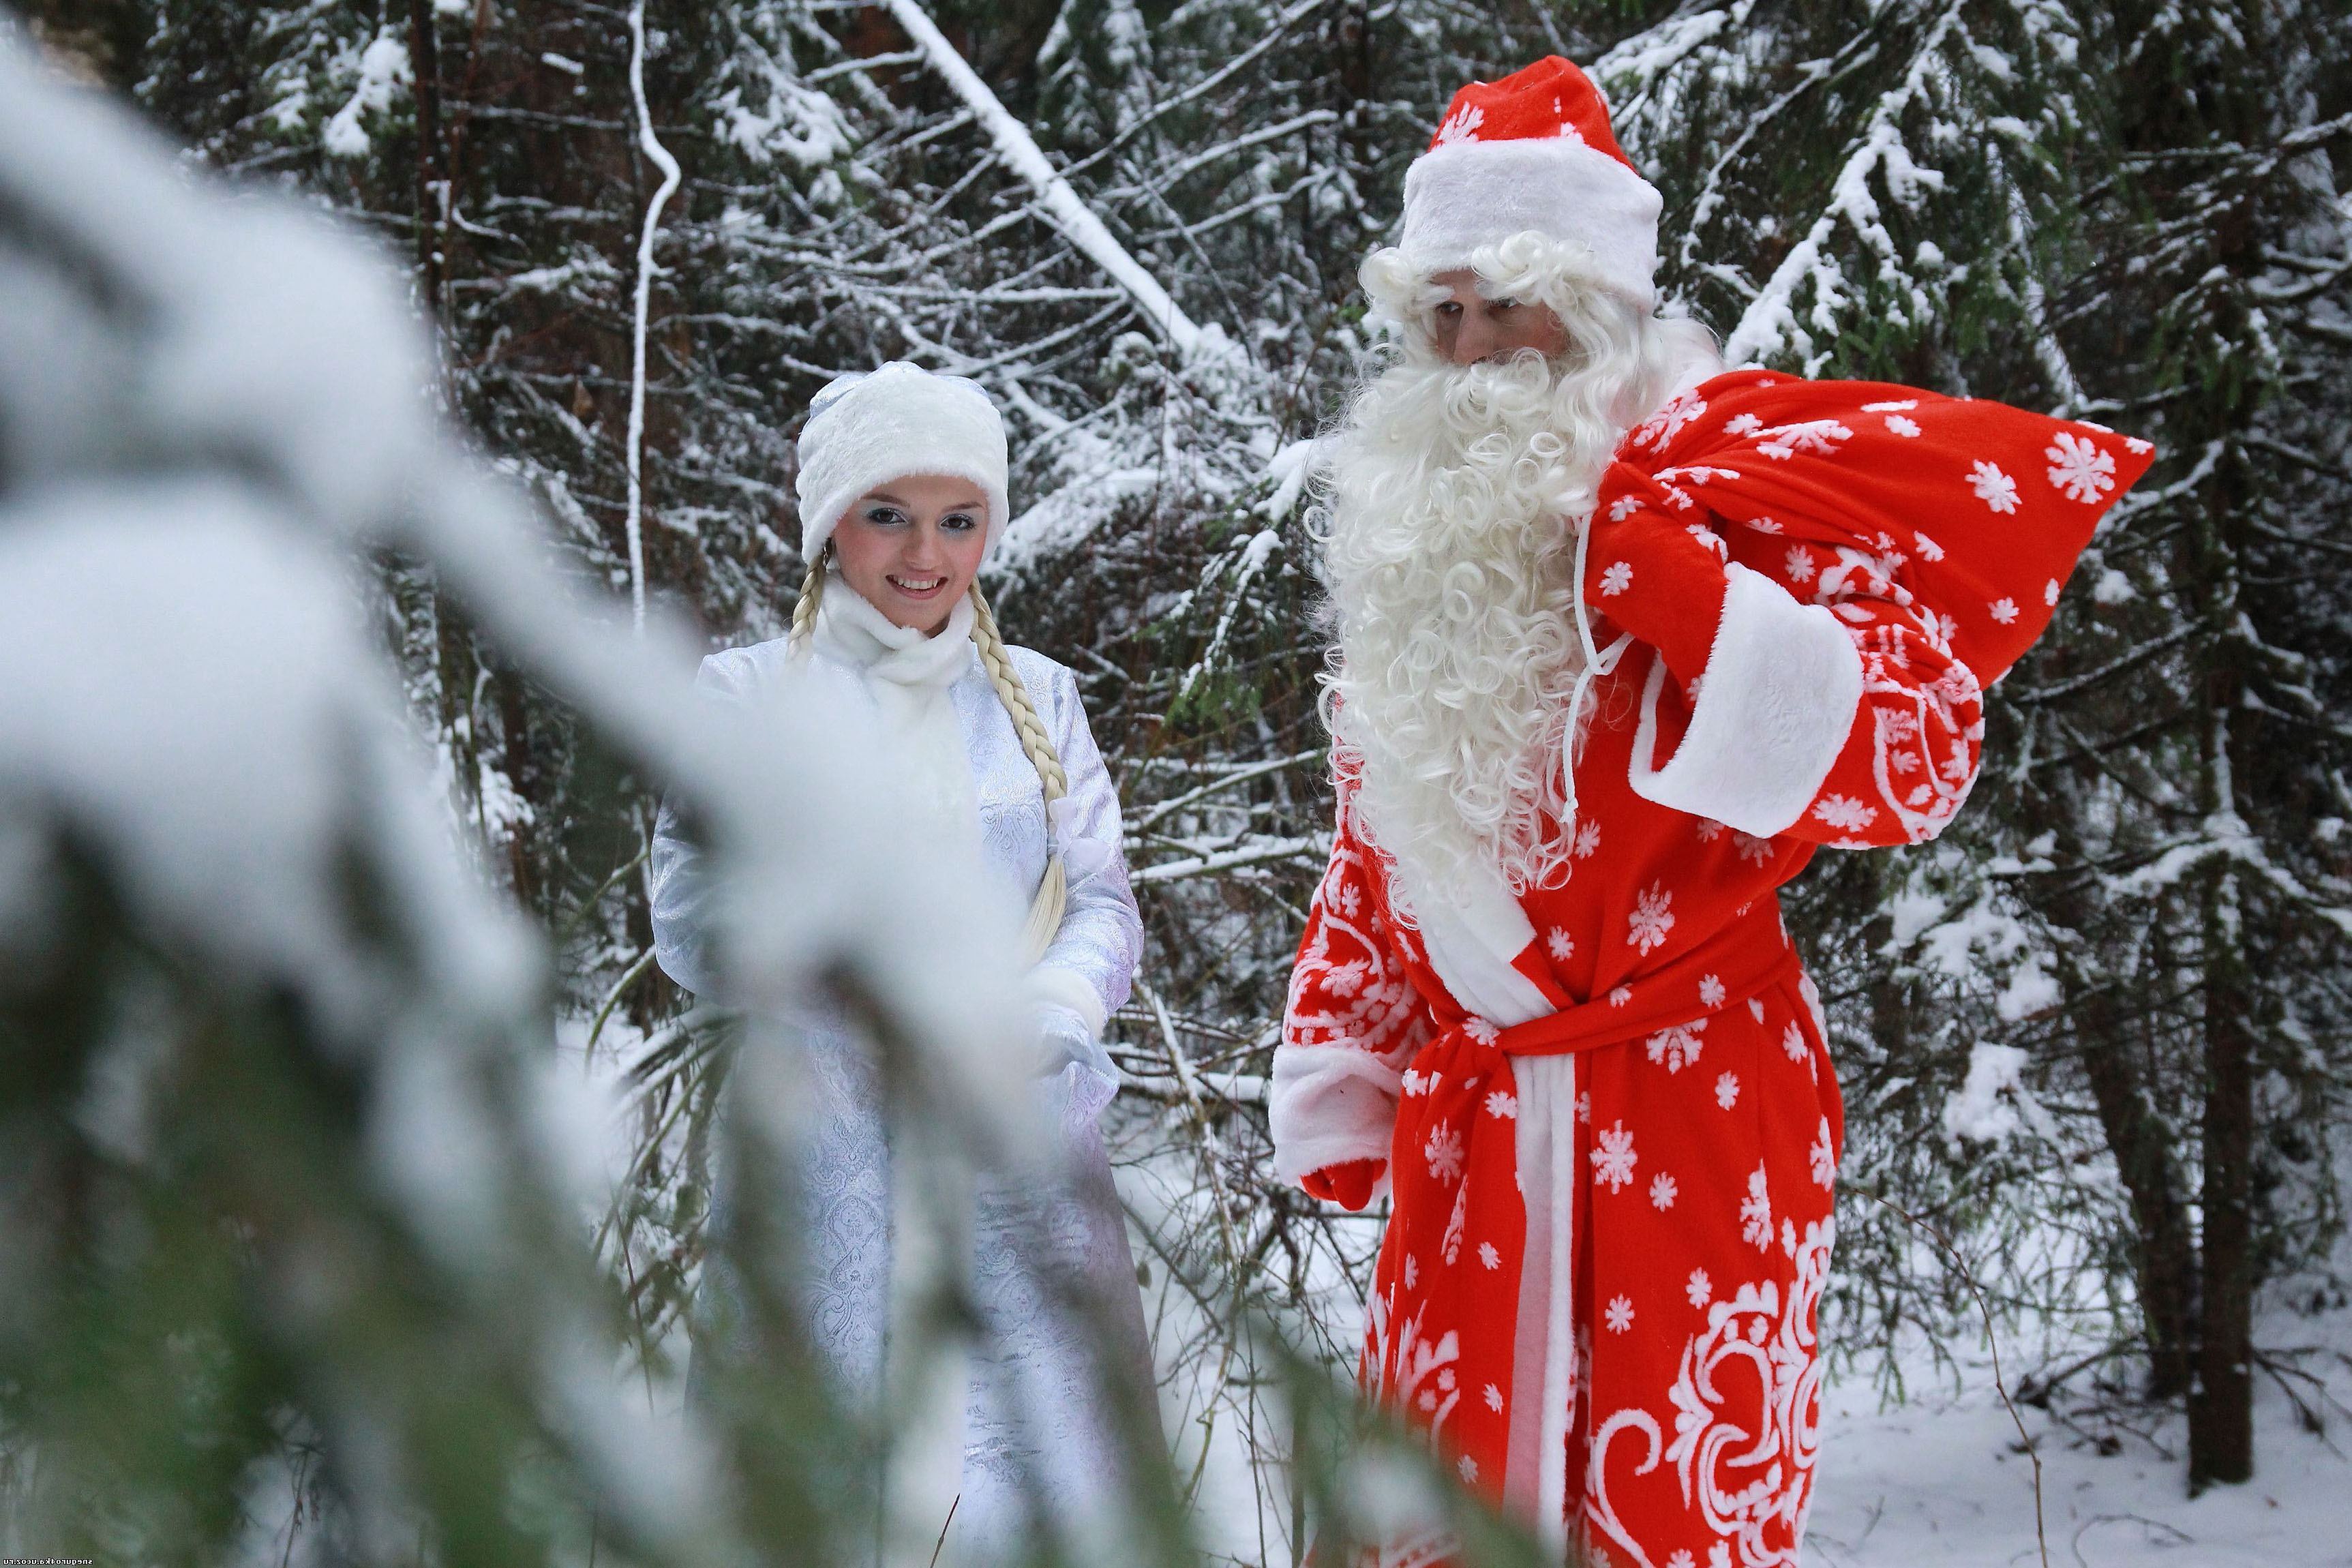 HDoboi.Kiev.ua - Дед мороз и снегурочка в зимнем лесу